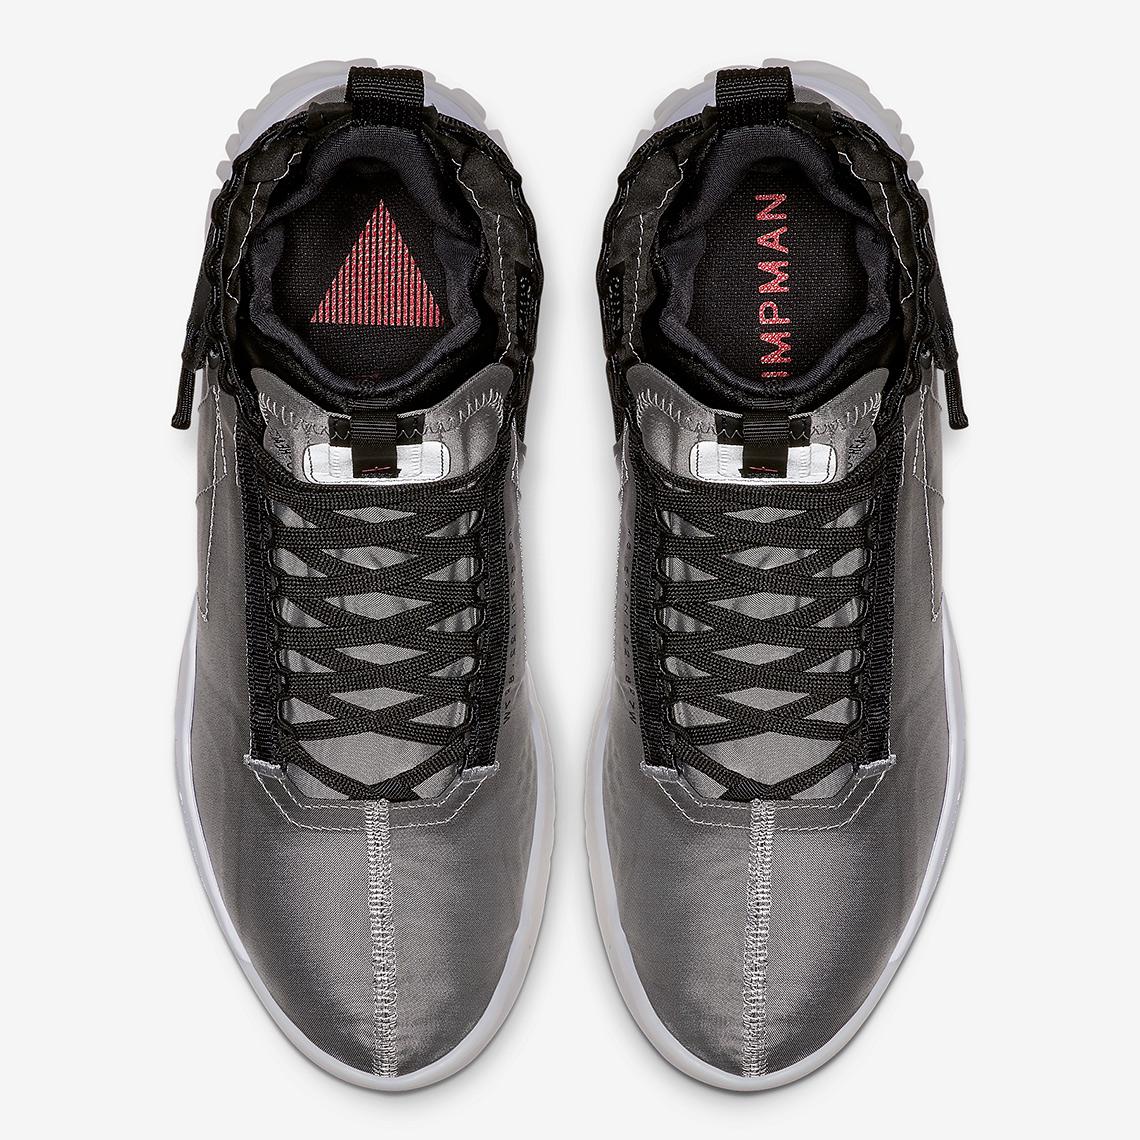 save off 425ac fdb5a Jordan Proto Rect Metallic Silver BV1654-002   SneakerNews.com